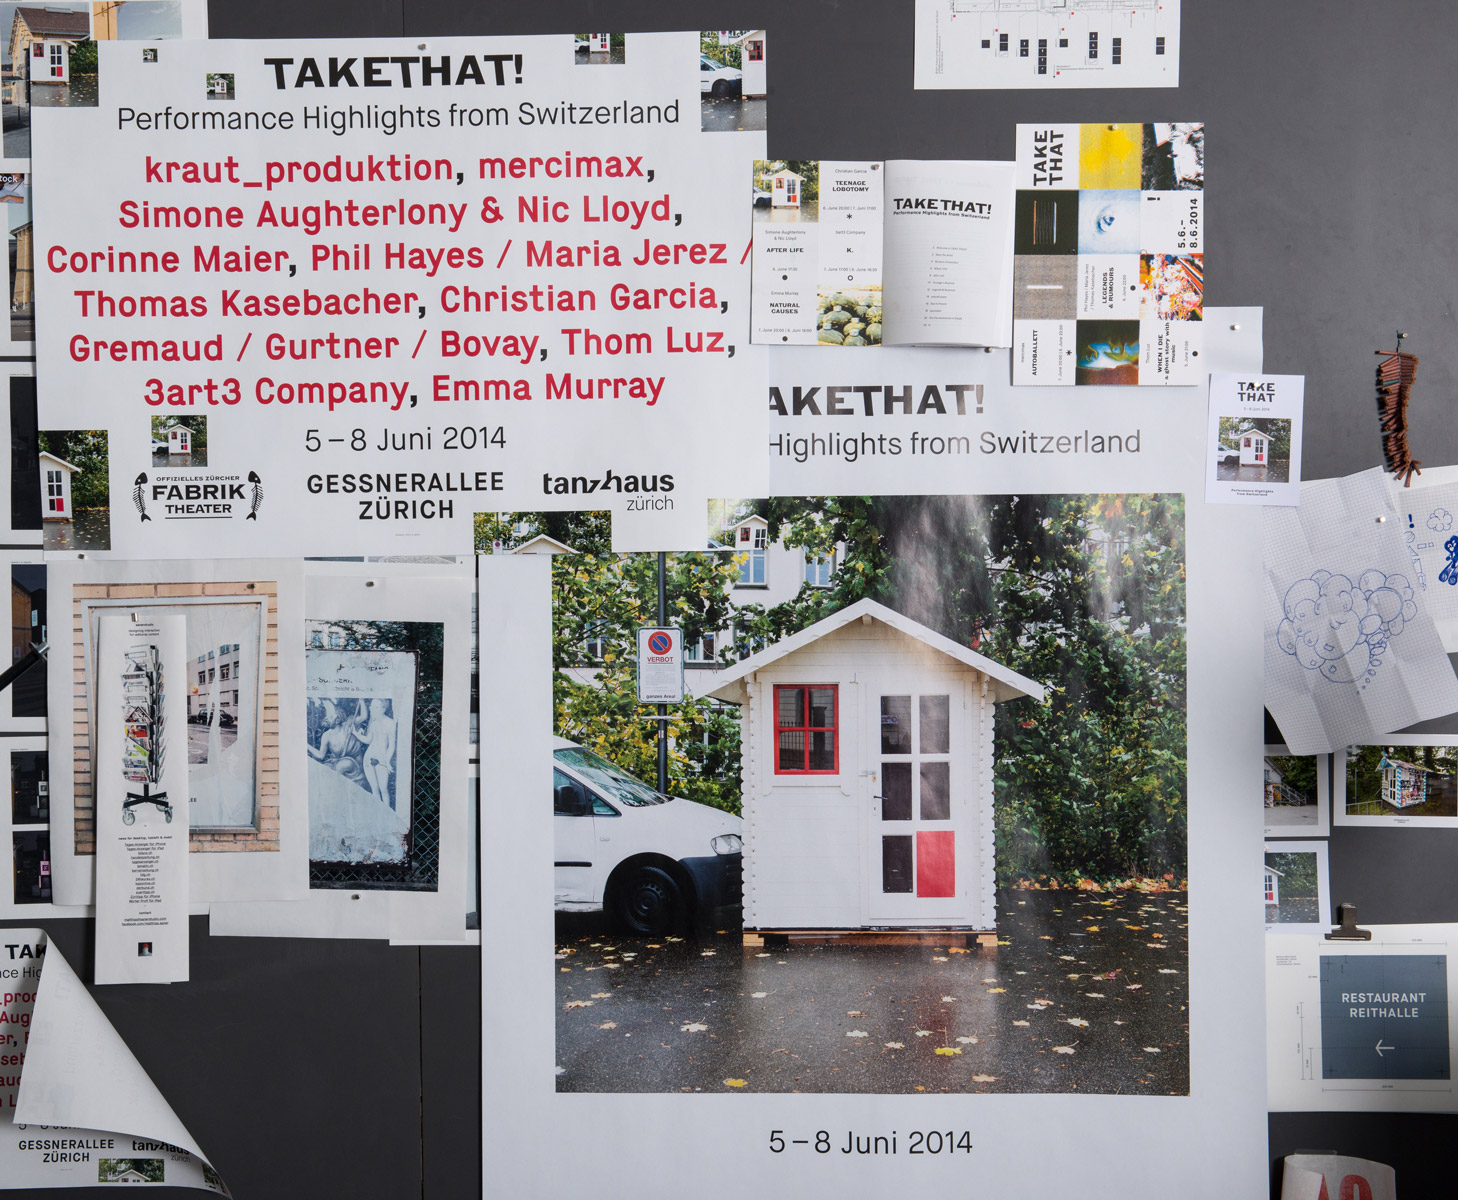 takethat-03